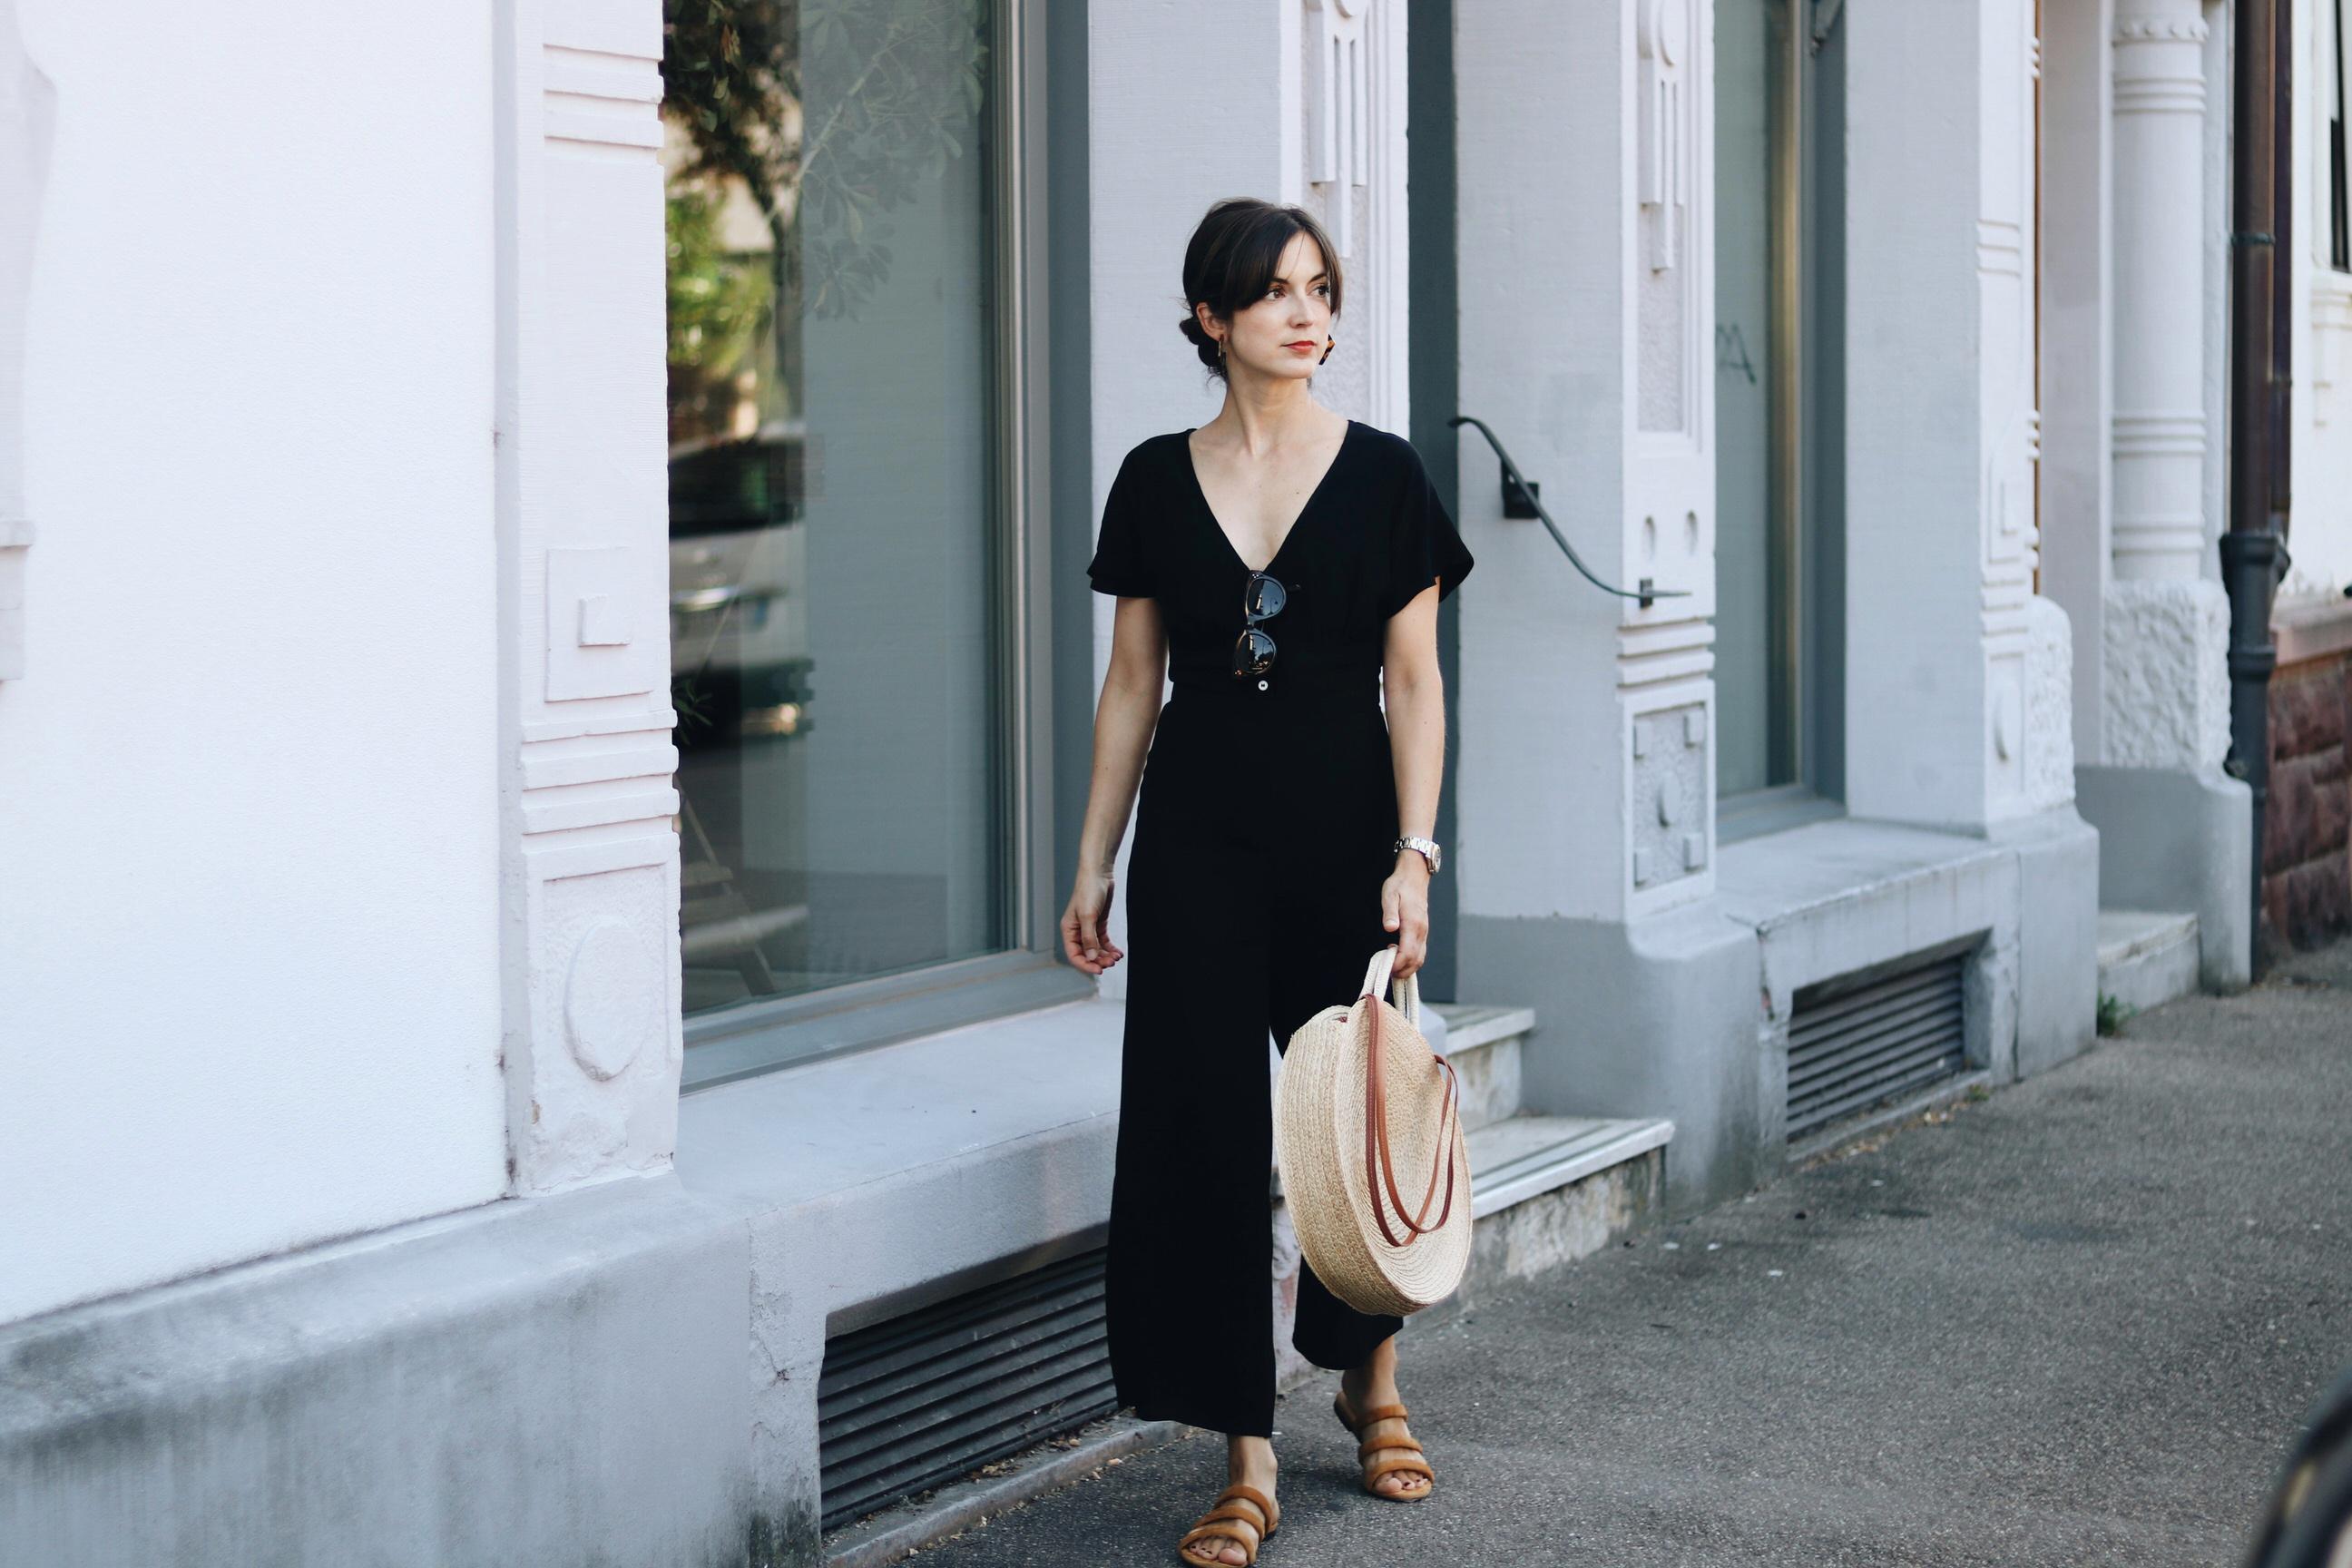 Modeblog Outfit French Chic Modebloggerin Neele Jumpsuit schwarz Klassiker Korbtasche rund Streetstyle Look Fashion